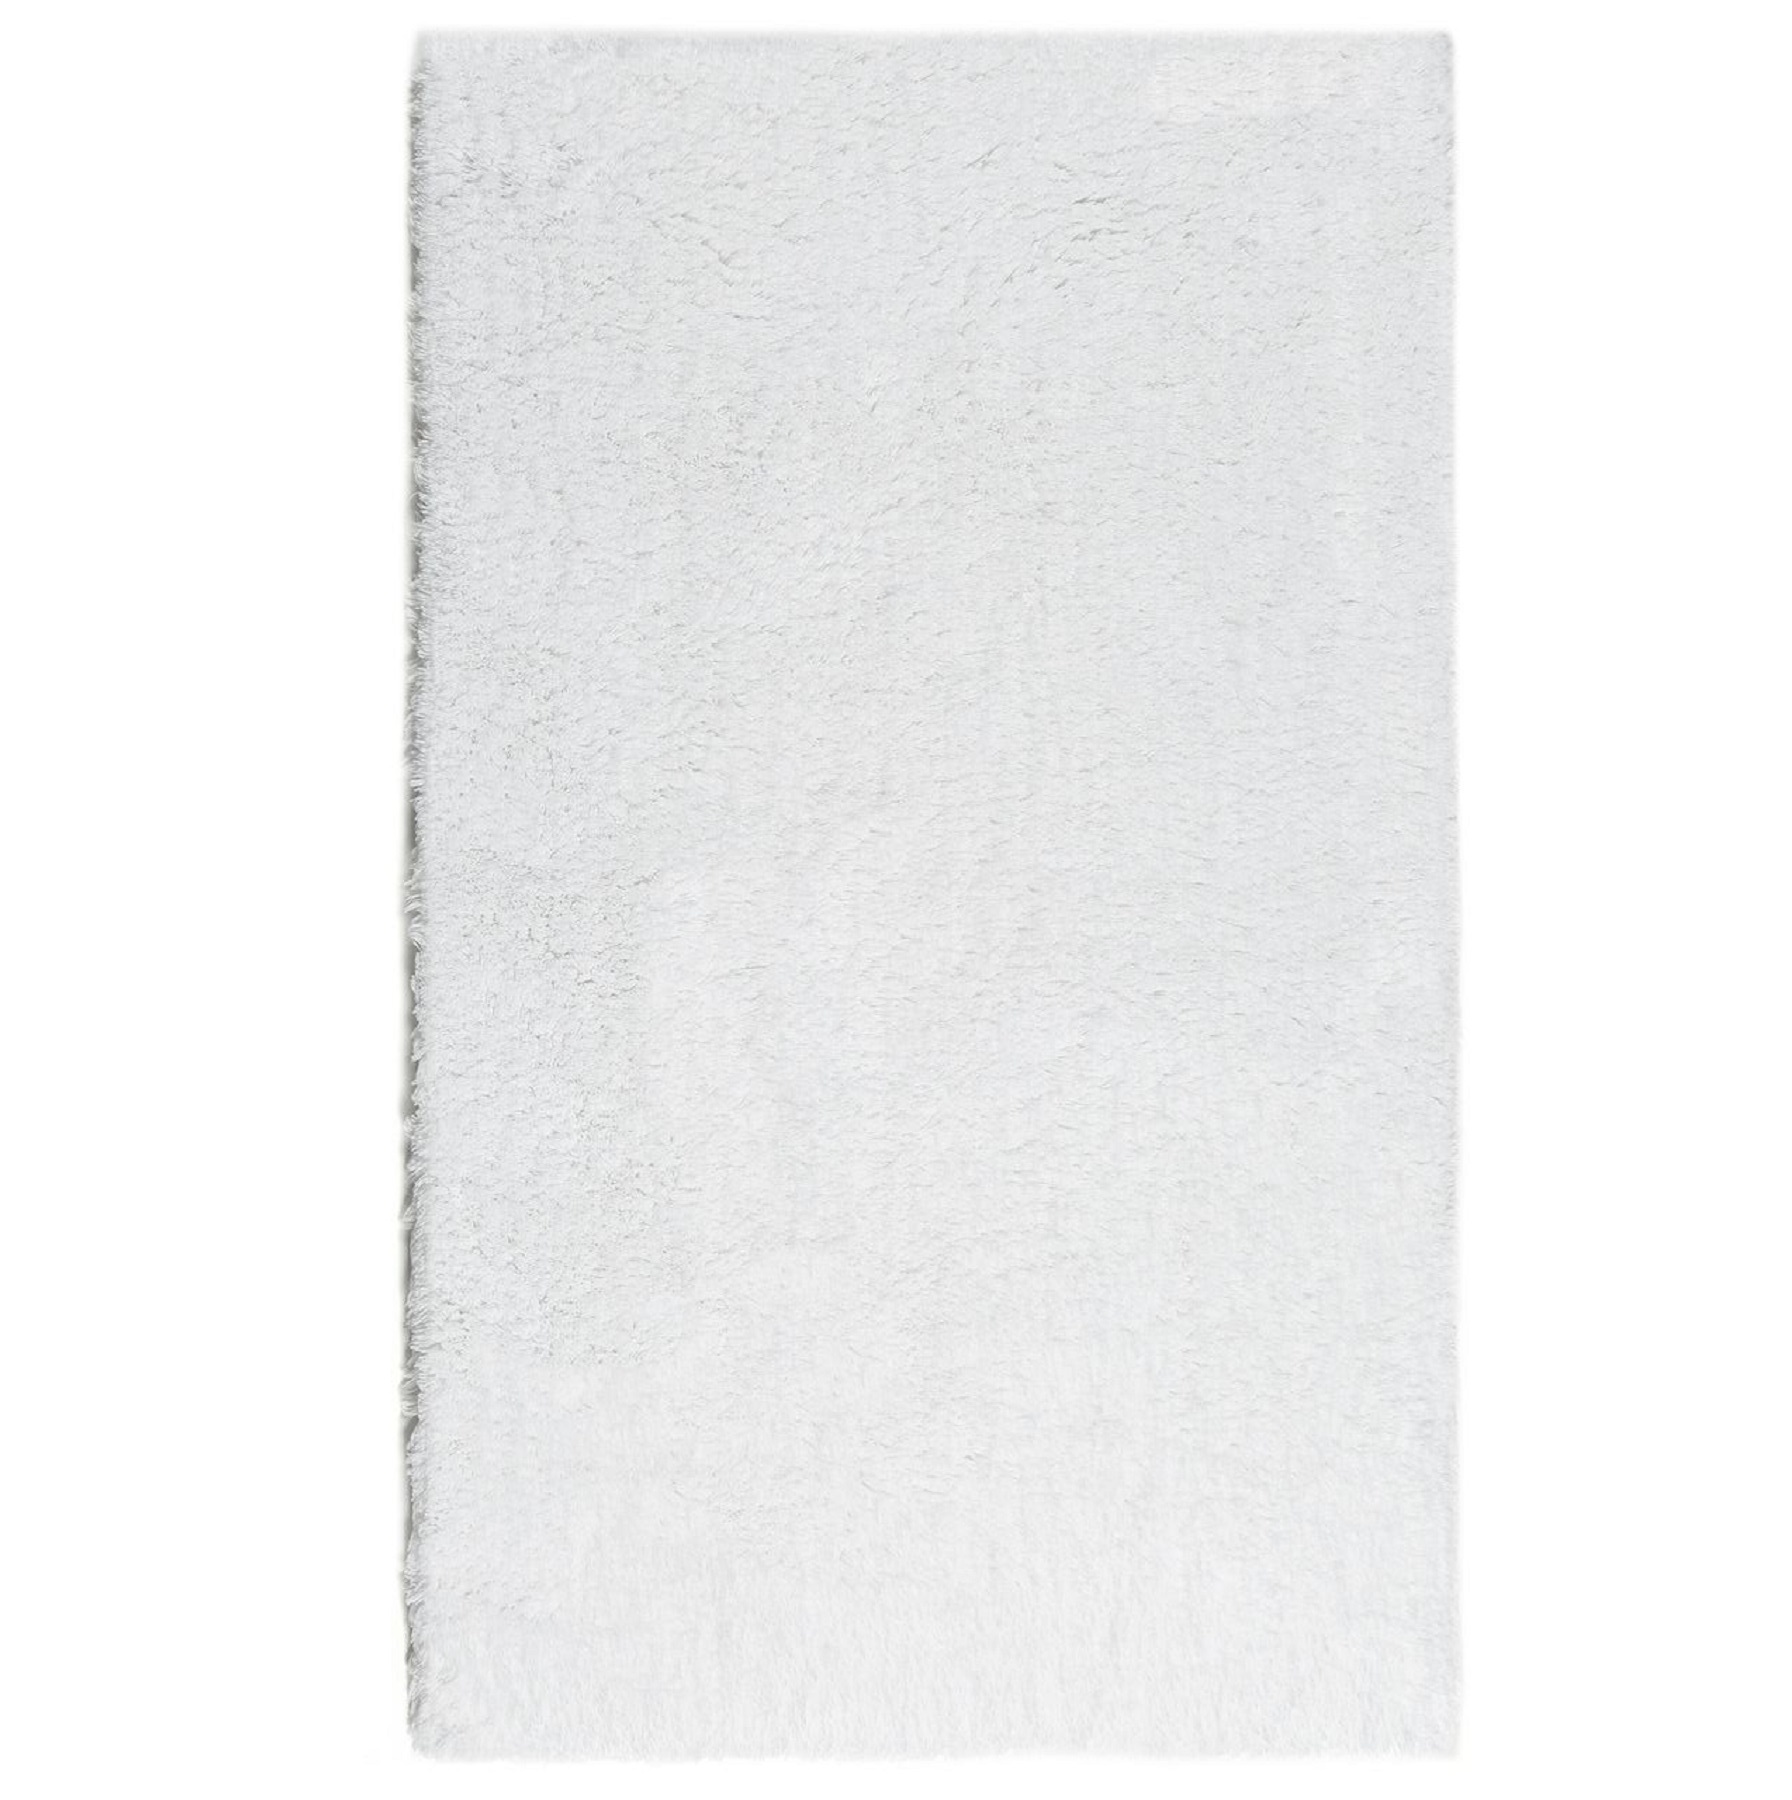 Коврики для ванной Коврик для ванной 51x81 Kassatex Shaggy Bamboo White elitnyy-kovrik-dlya-vannoy-shaggy-bamboo-white-ot-kassatex-portugaliya.jpeg